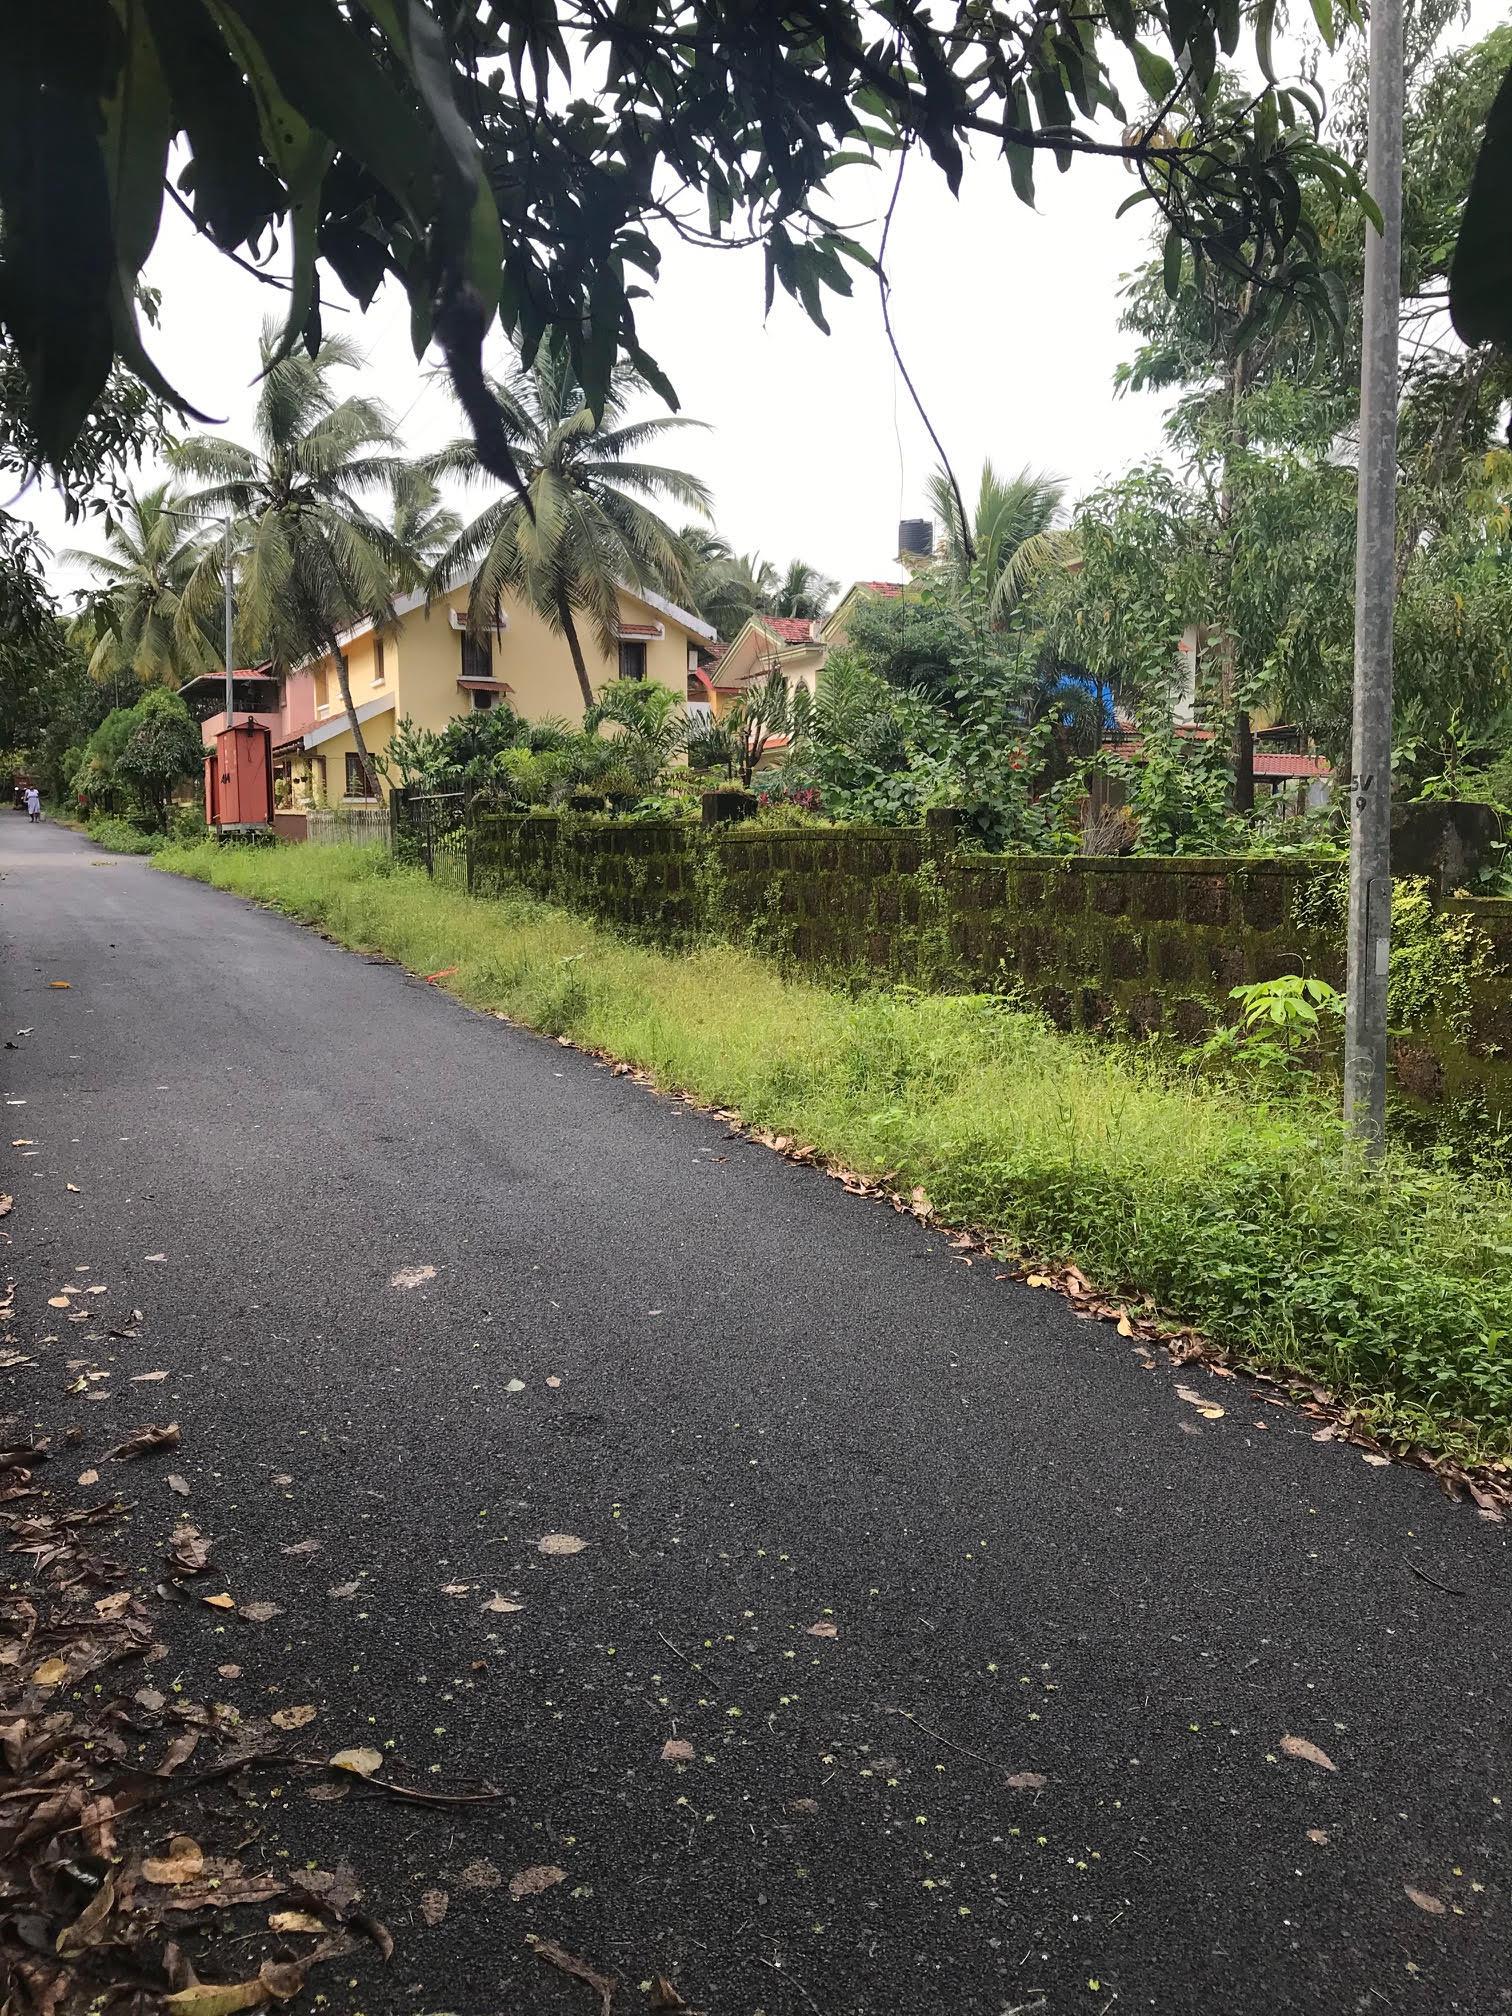 Independent 3bhk Villa in Solitaire Villa colony, Nuvem ₹1.4 crores